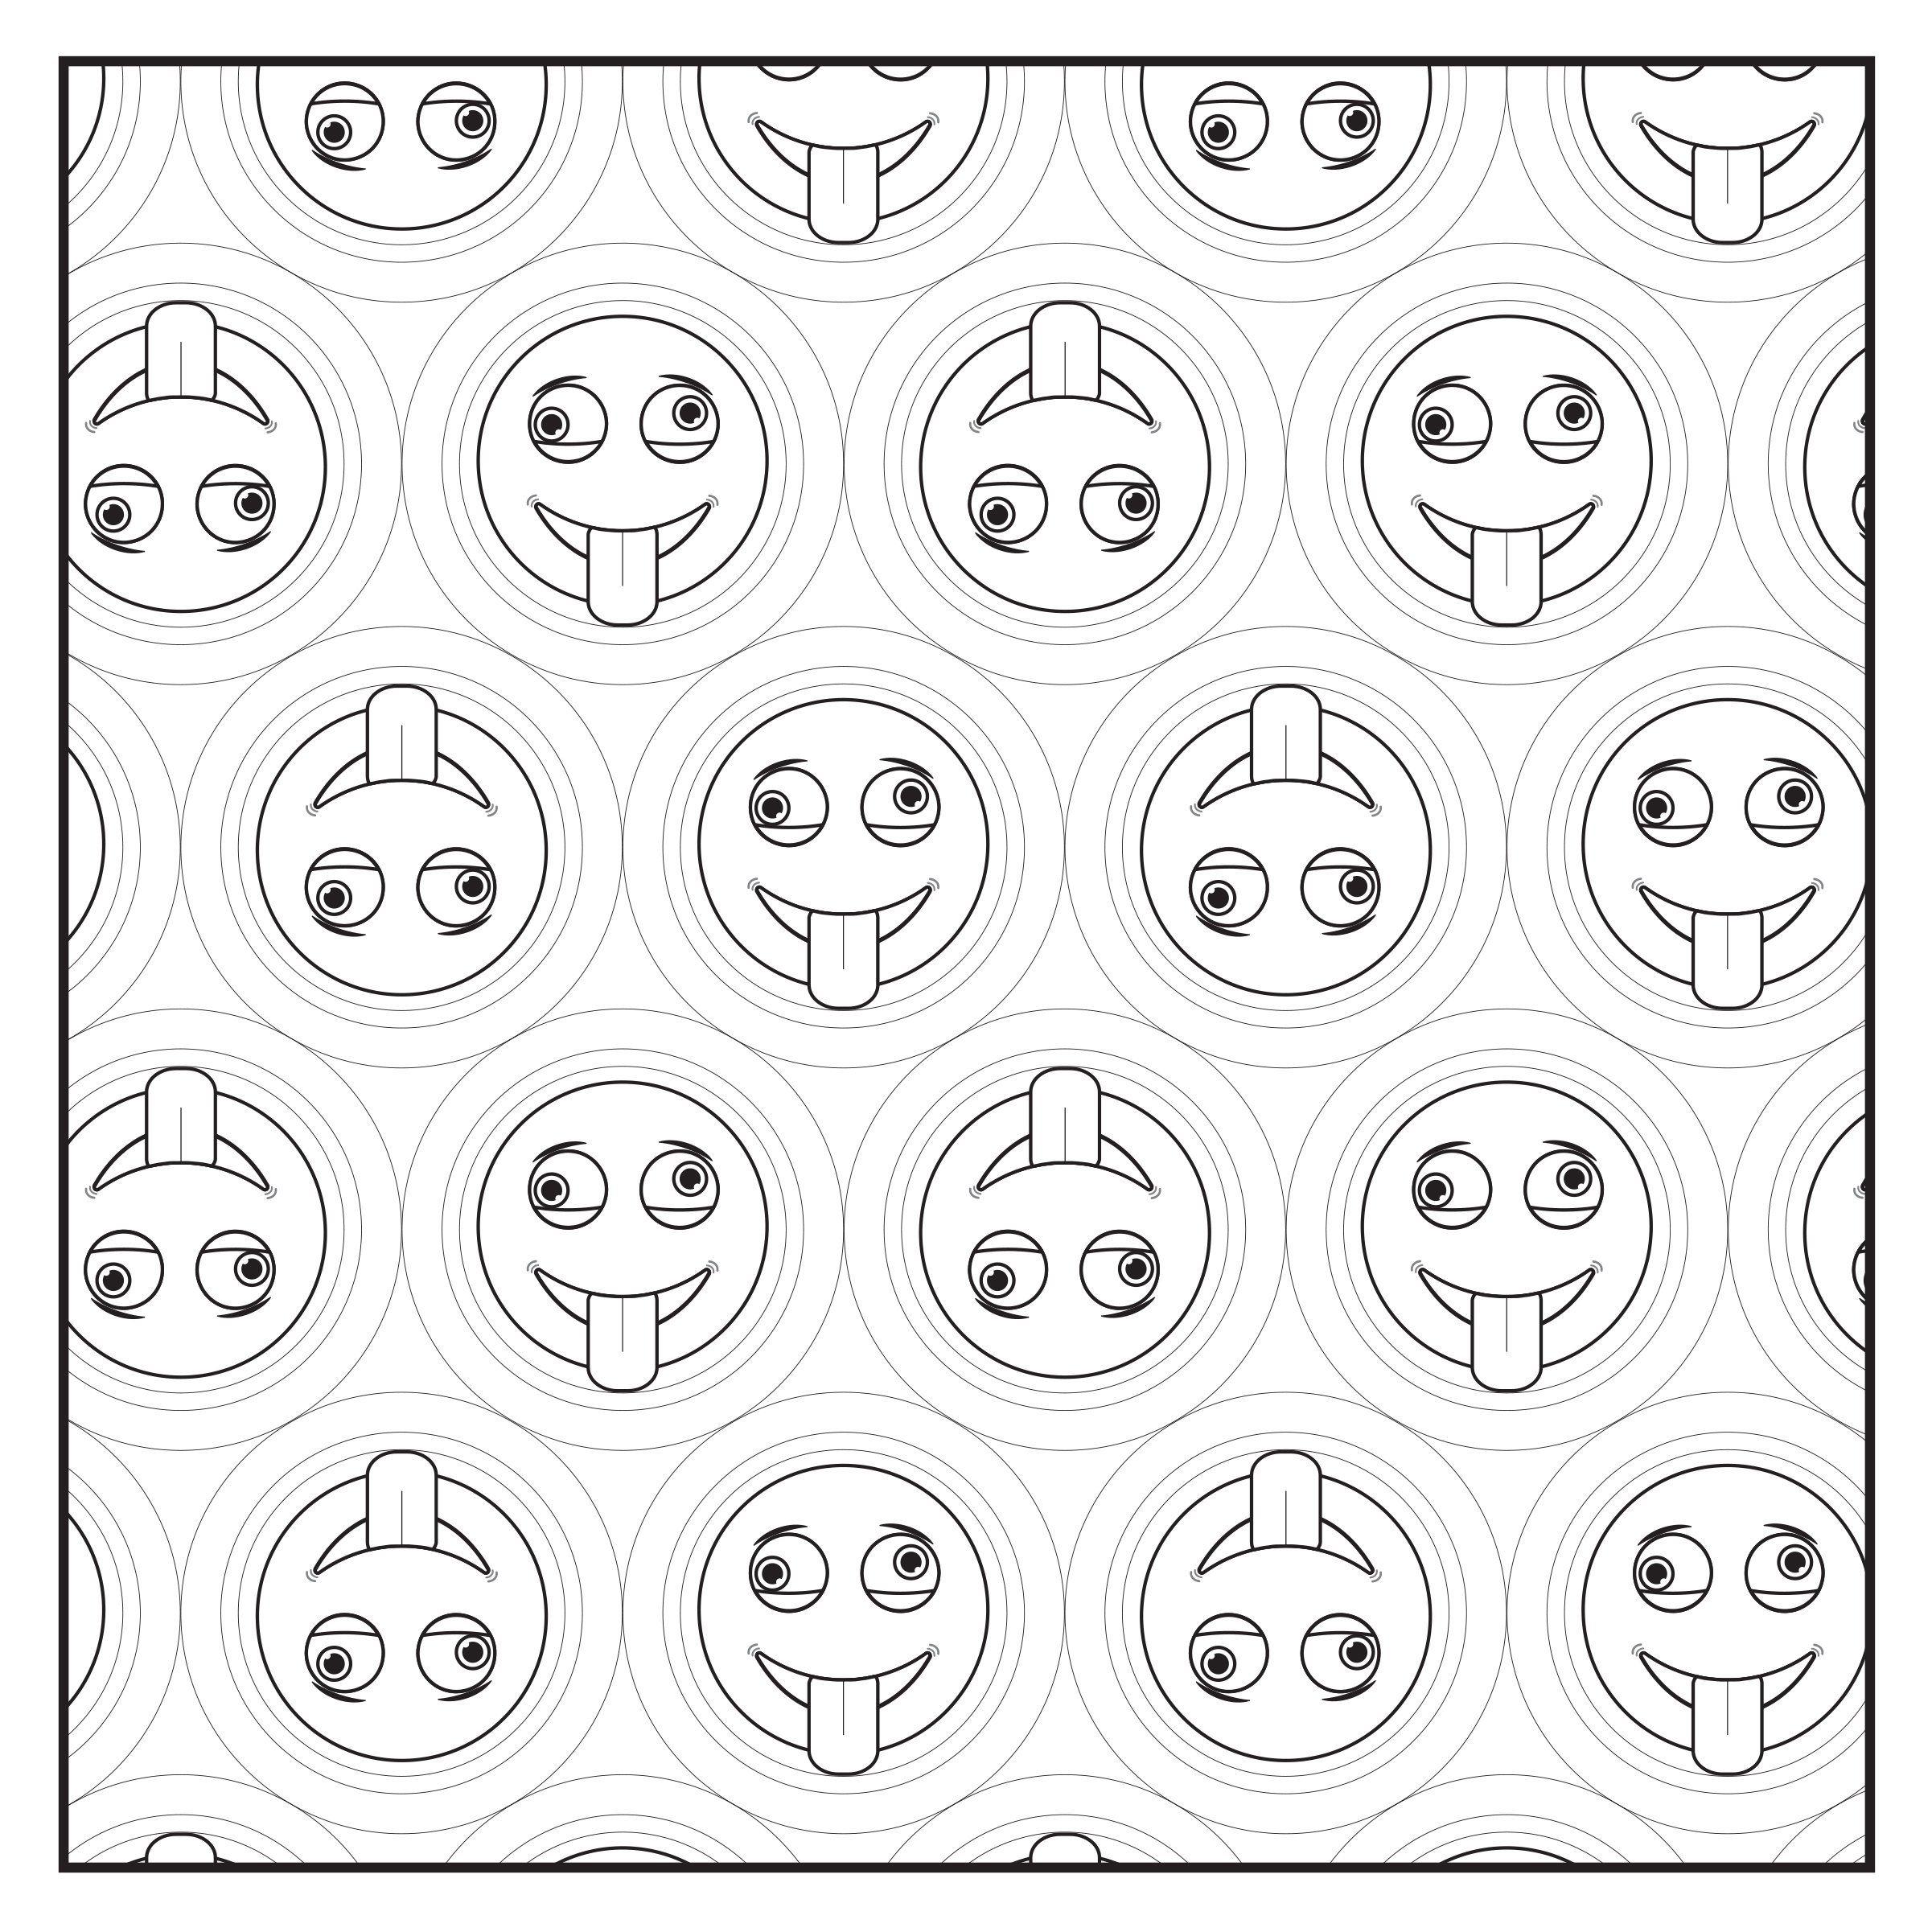 Amazon Emoji Crazy Fun Adult Coloring Book and Teens Coloring